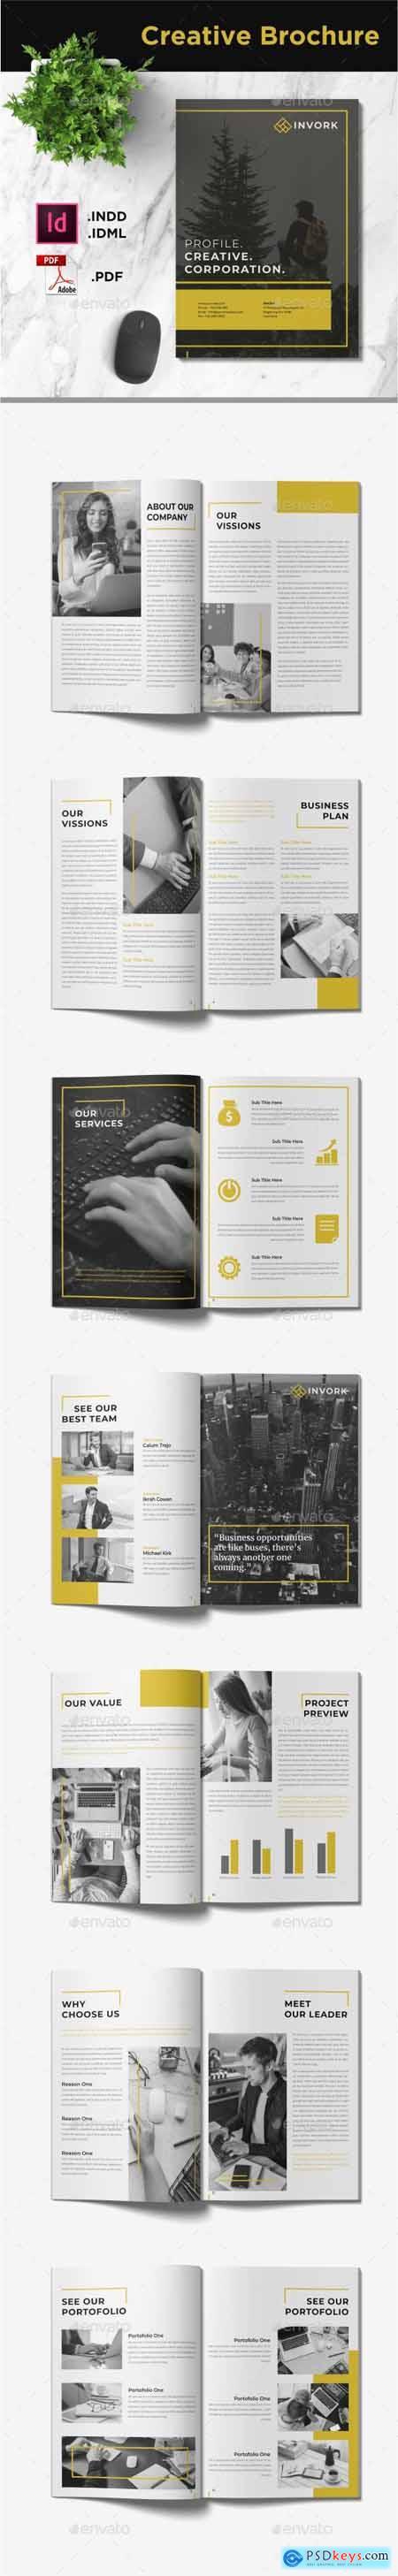 Invork - Business Brochure Template 28458511